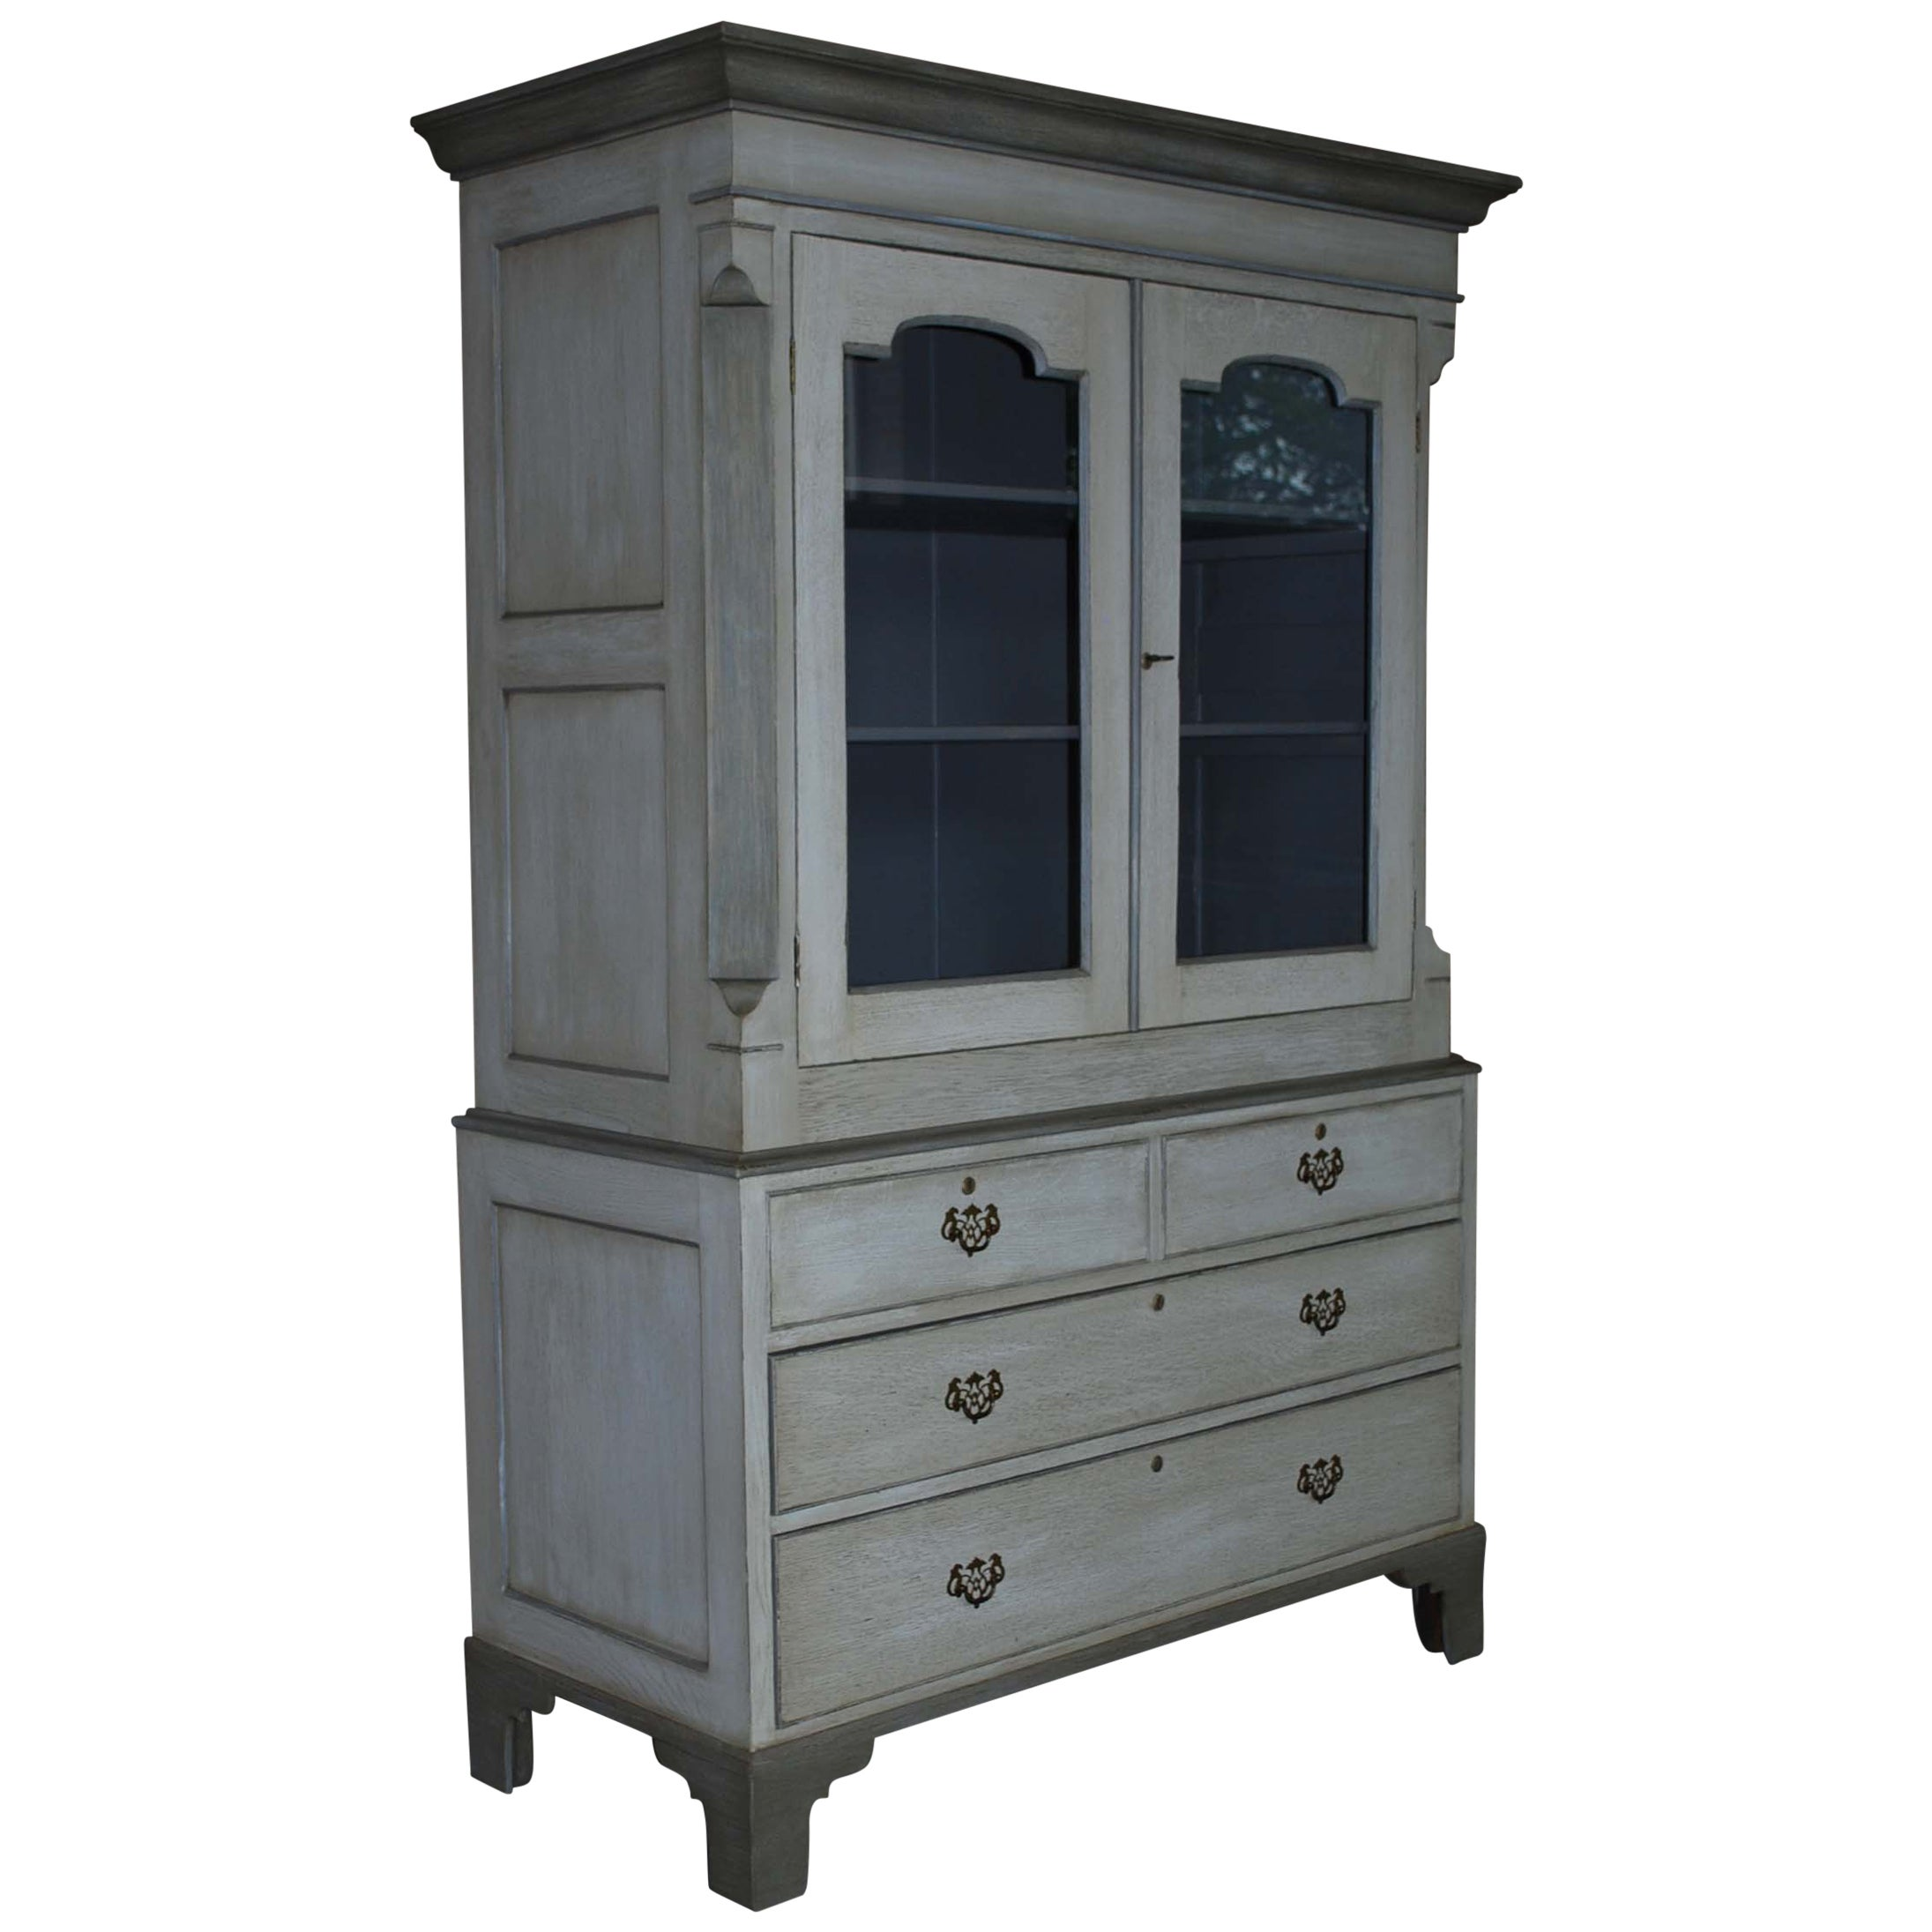 19th Century Painted Oakwood Kitchen Cabinet